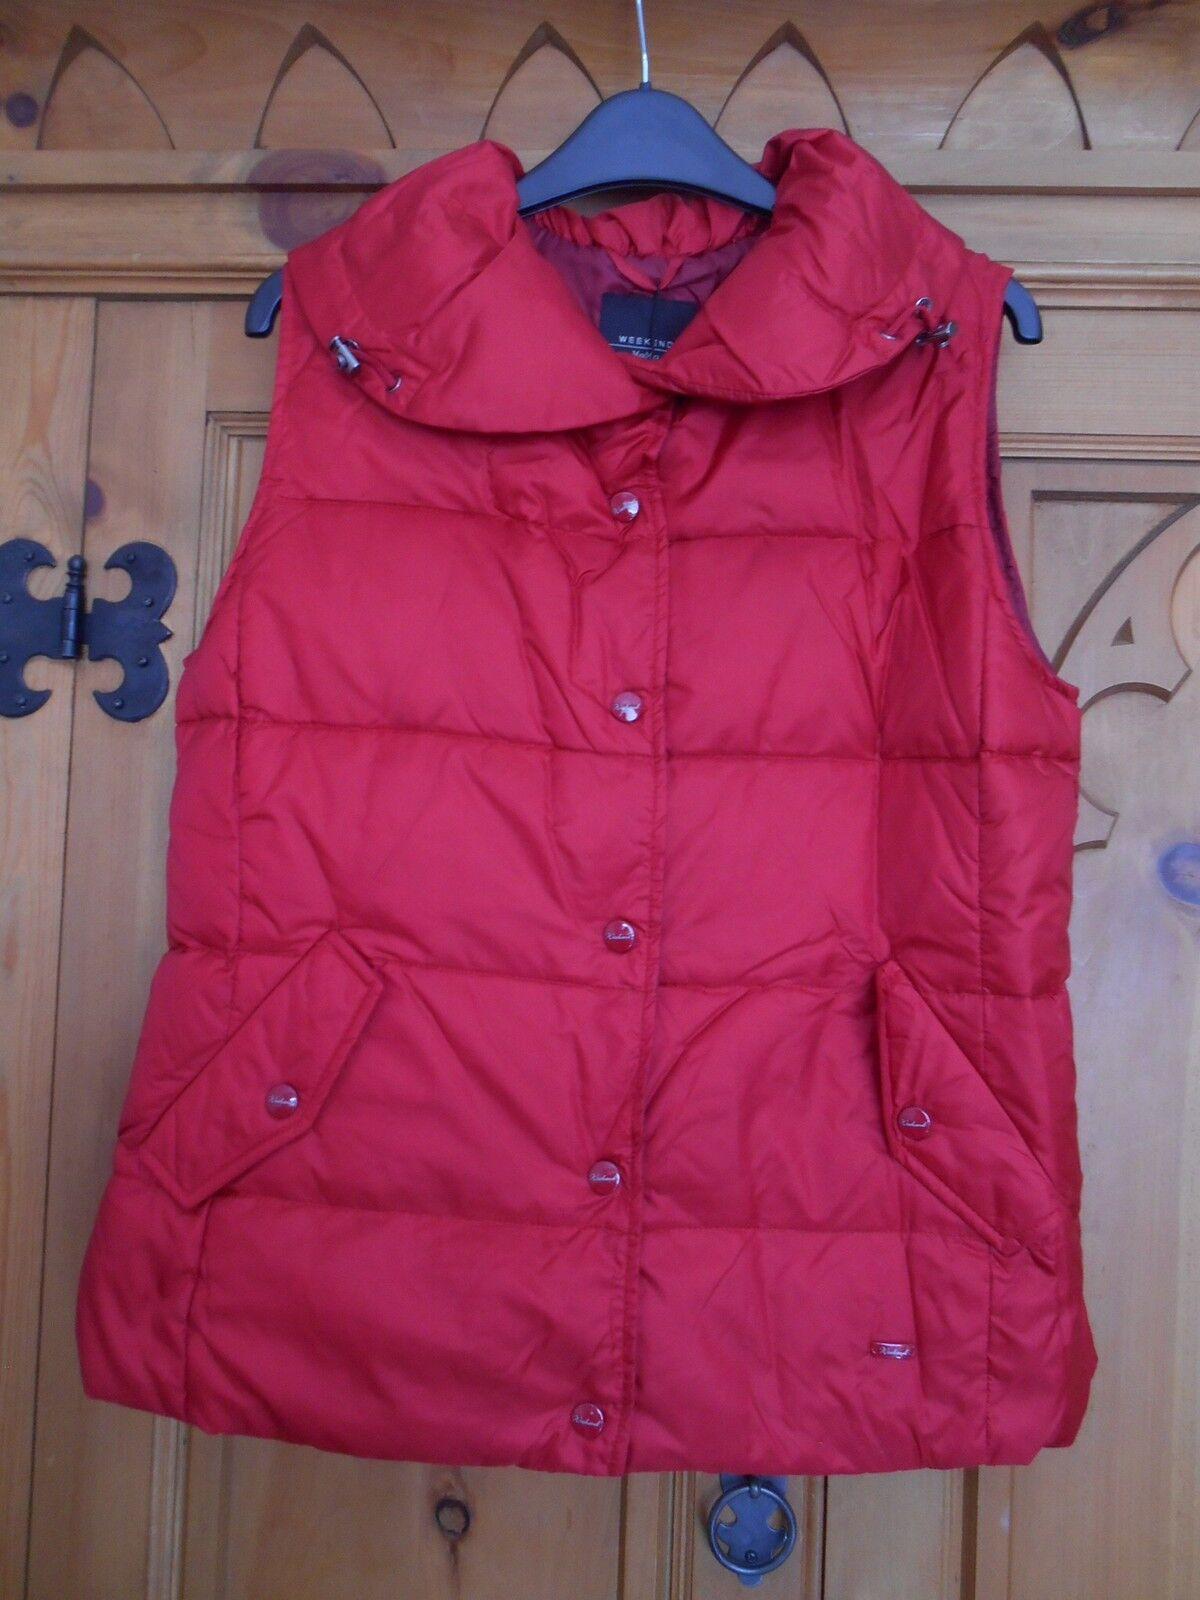 Authentic Max Mara Maxmara Weekend Red Down Gilet Body warmer Bnwt 8 10